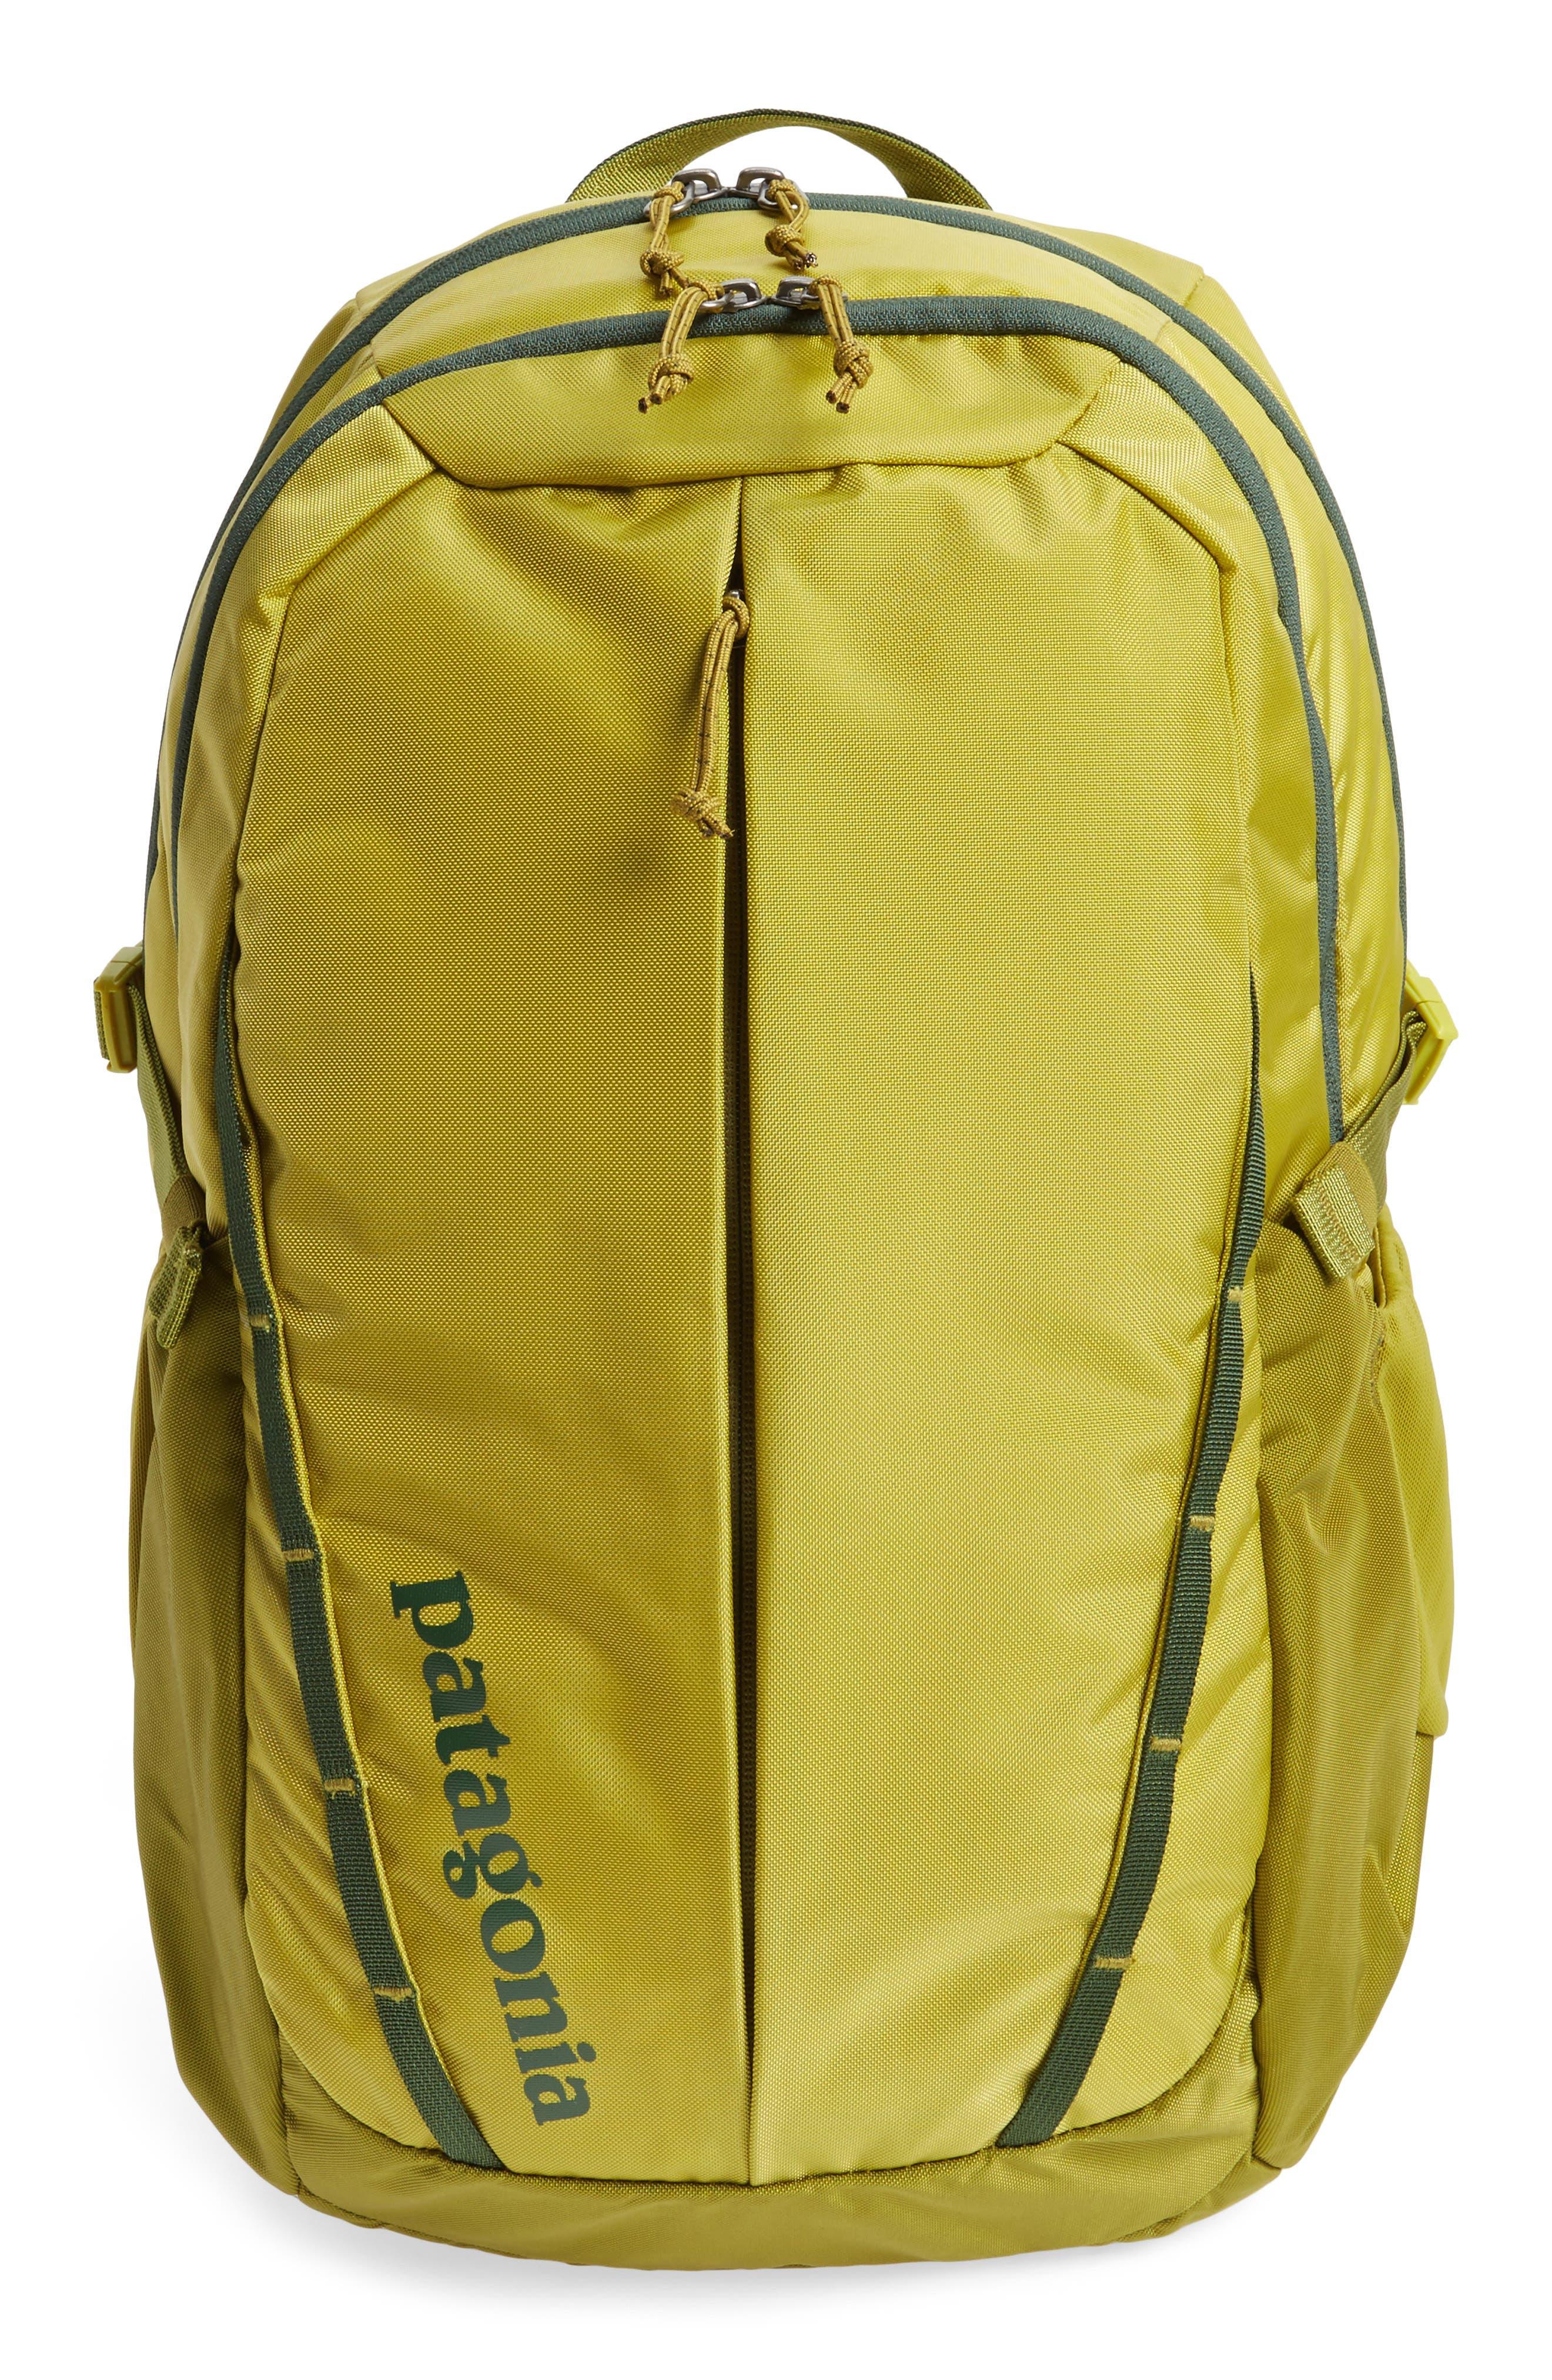 Patagonia 28L Refugio Backpack